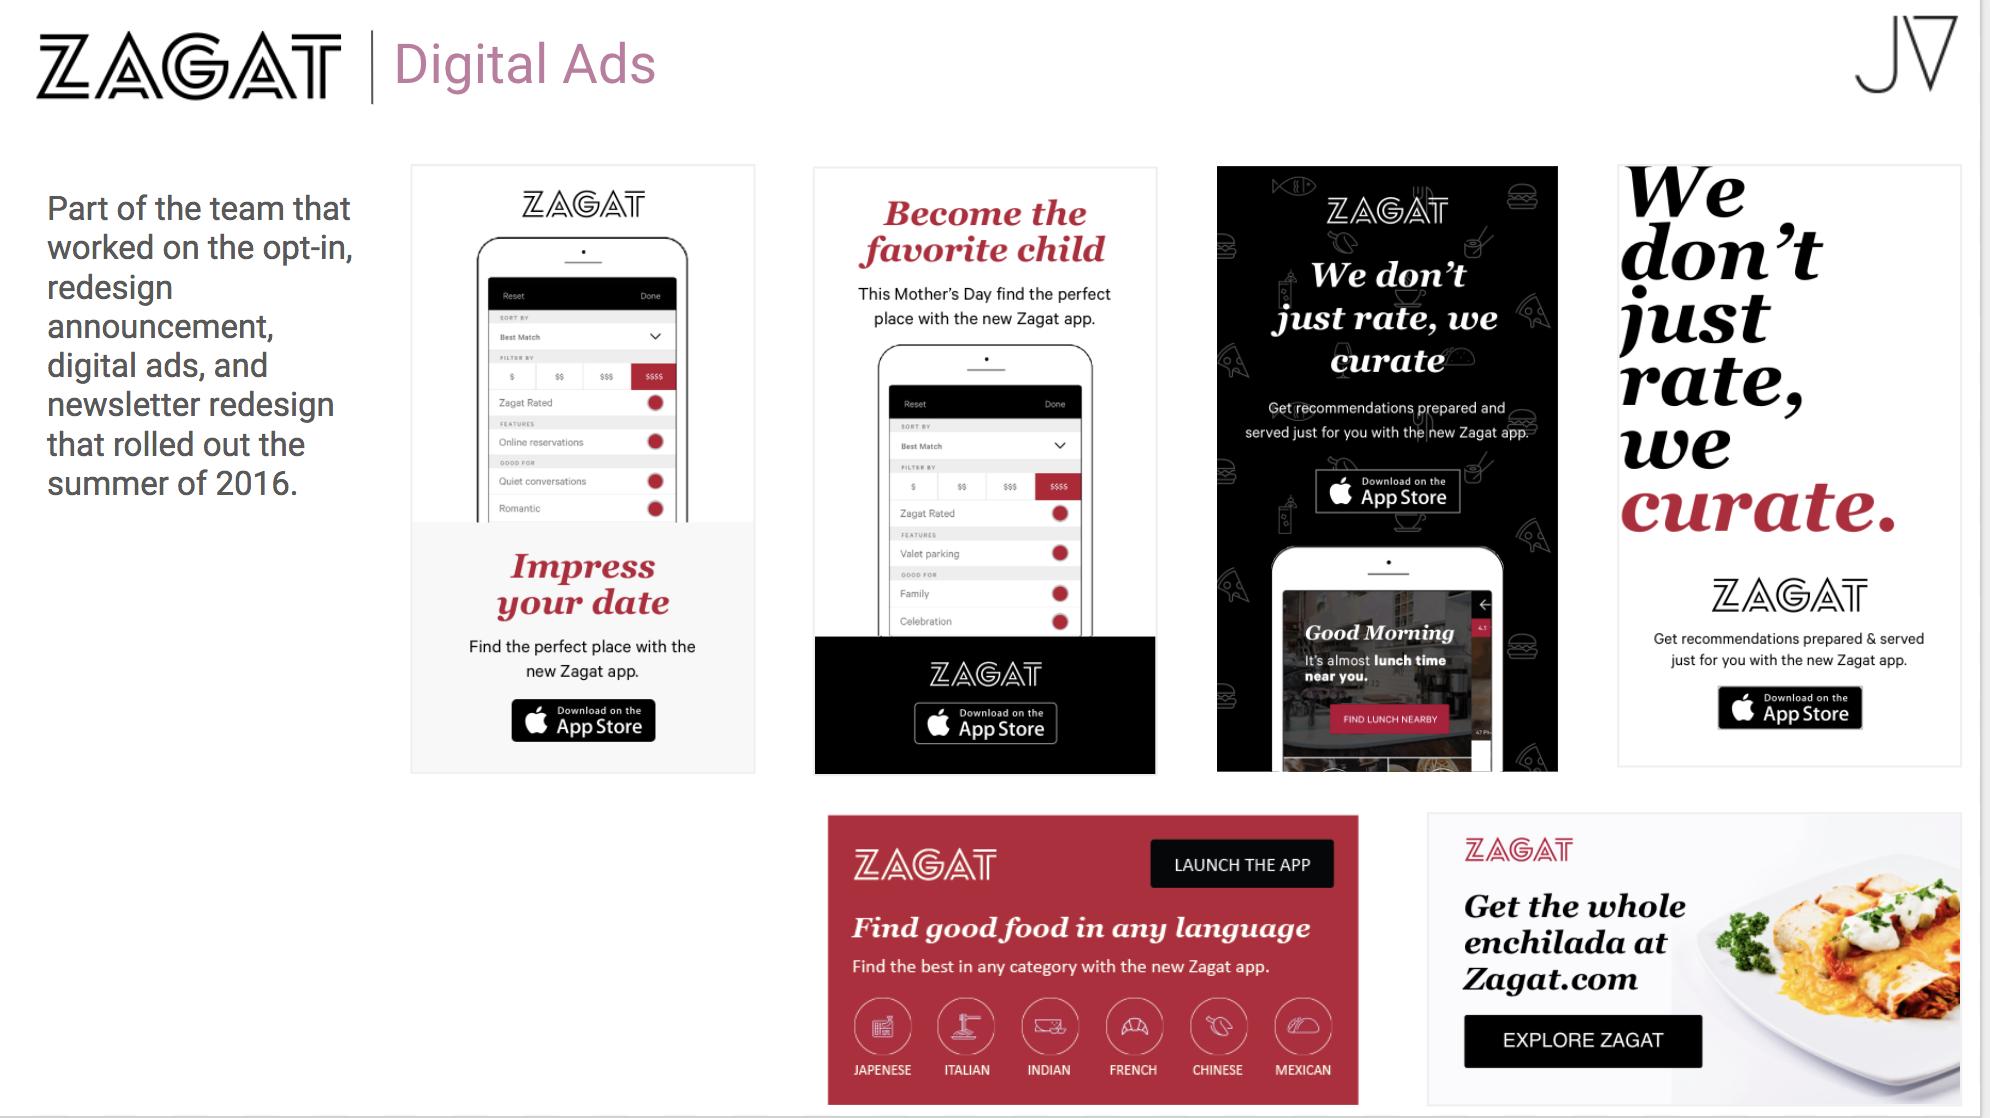 Zagat_Digital Ads_Epsilon_updated.png